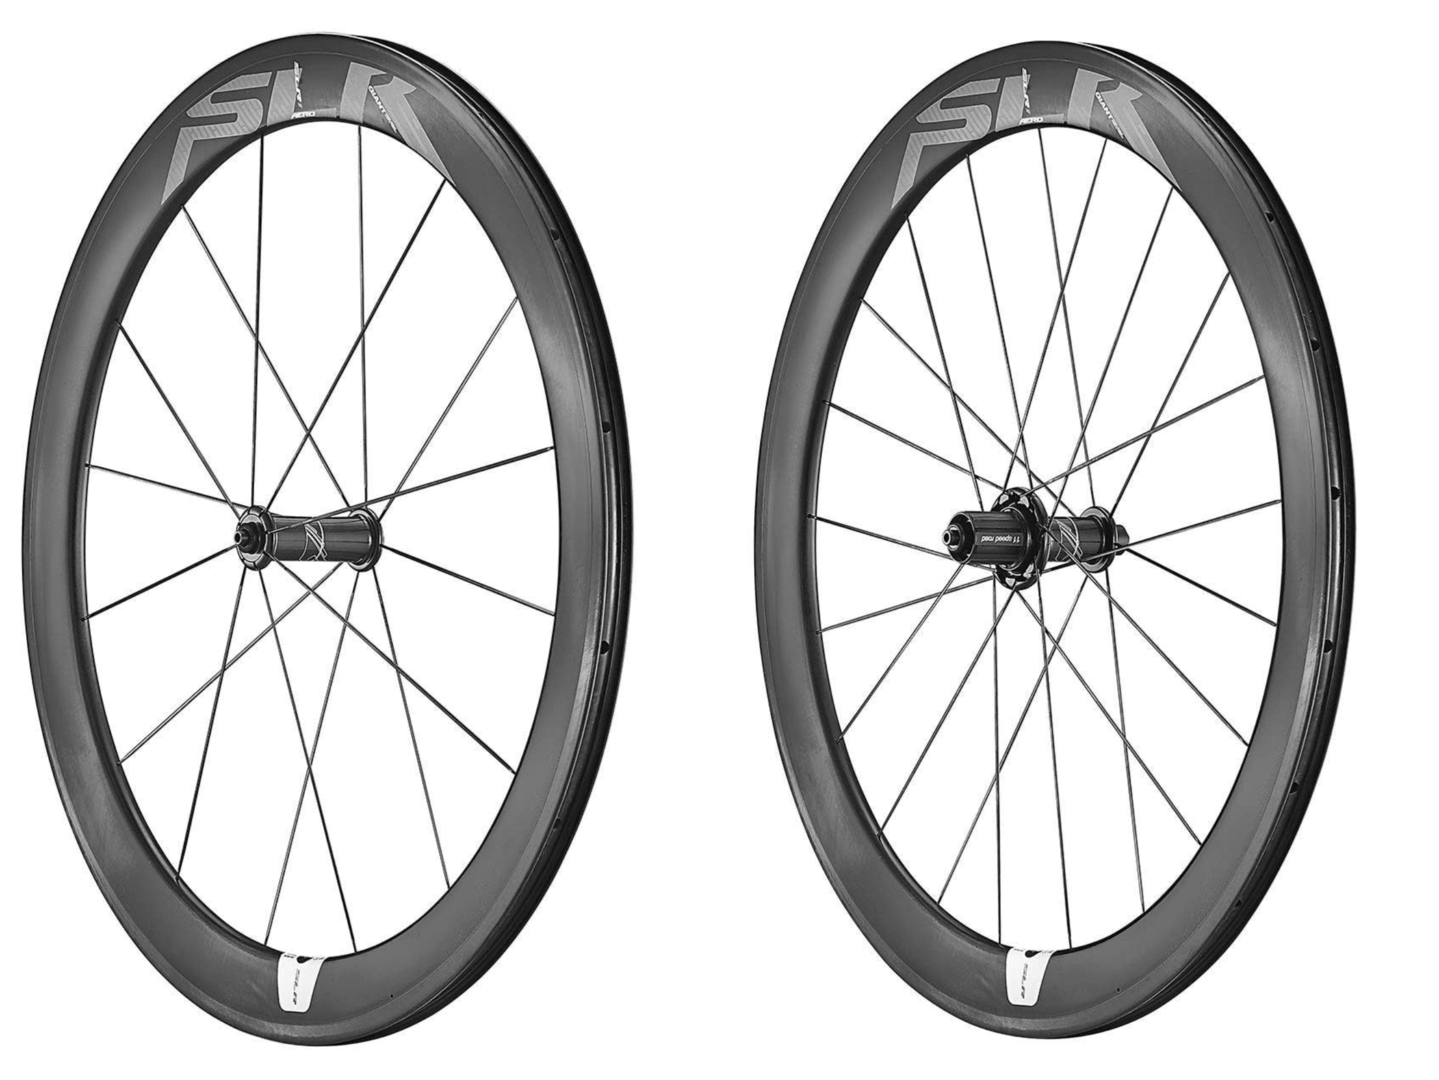 fbcdc0840ca Giant SLR 1 Aero wheelset - S-TEC sports